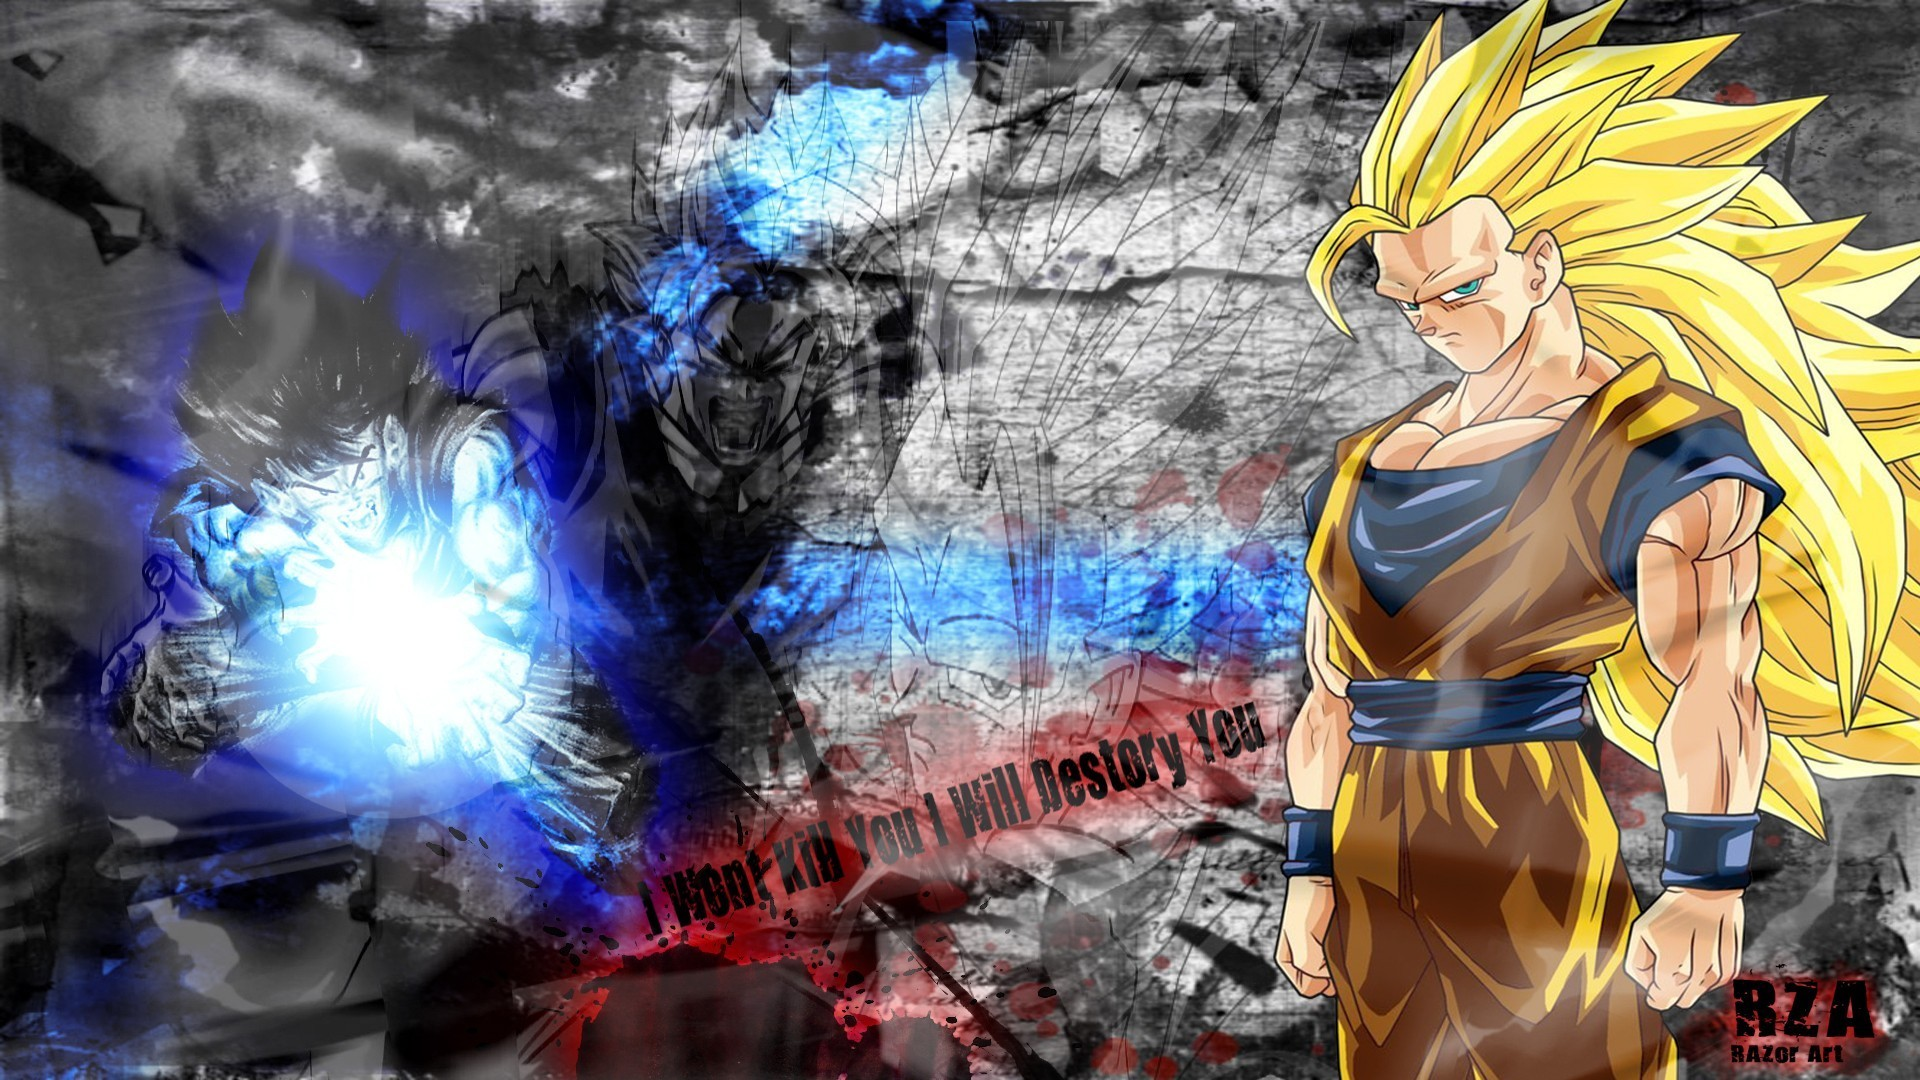 Cool Dragonballz Goku Epic Wallpaper, HQ Backgrounds | HD wallpapers .